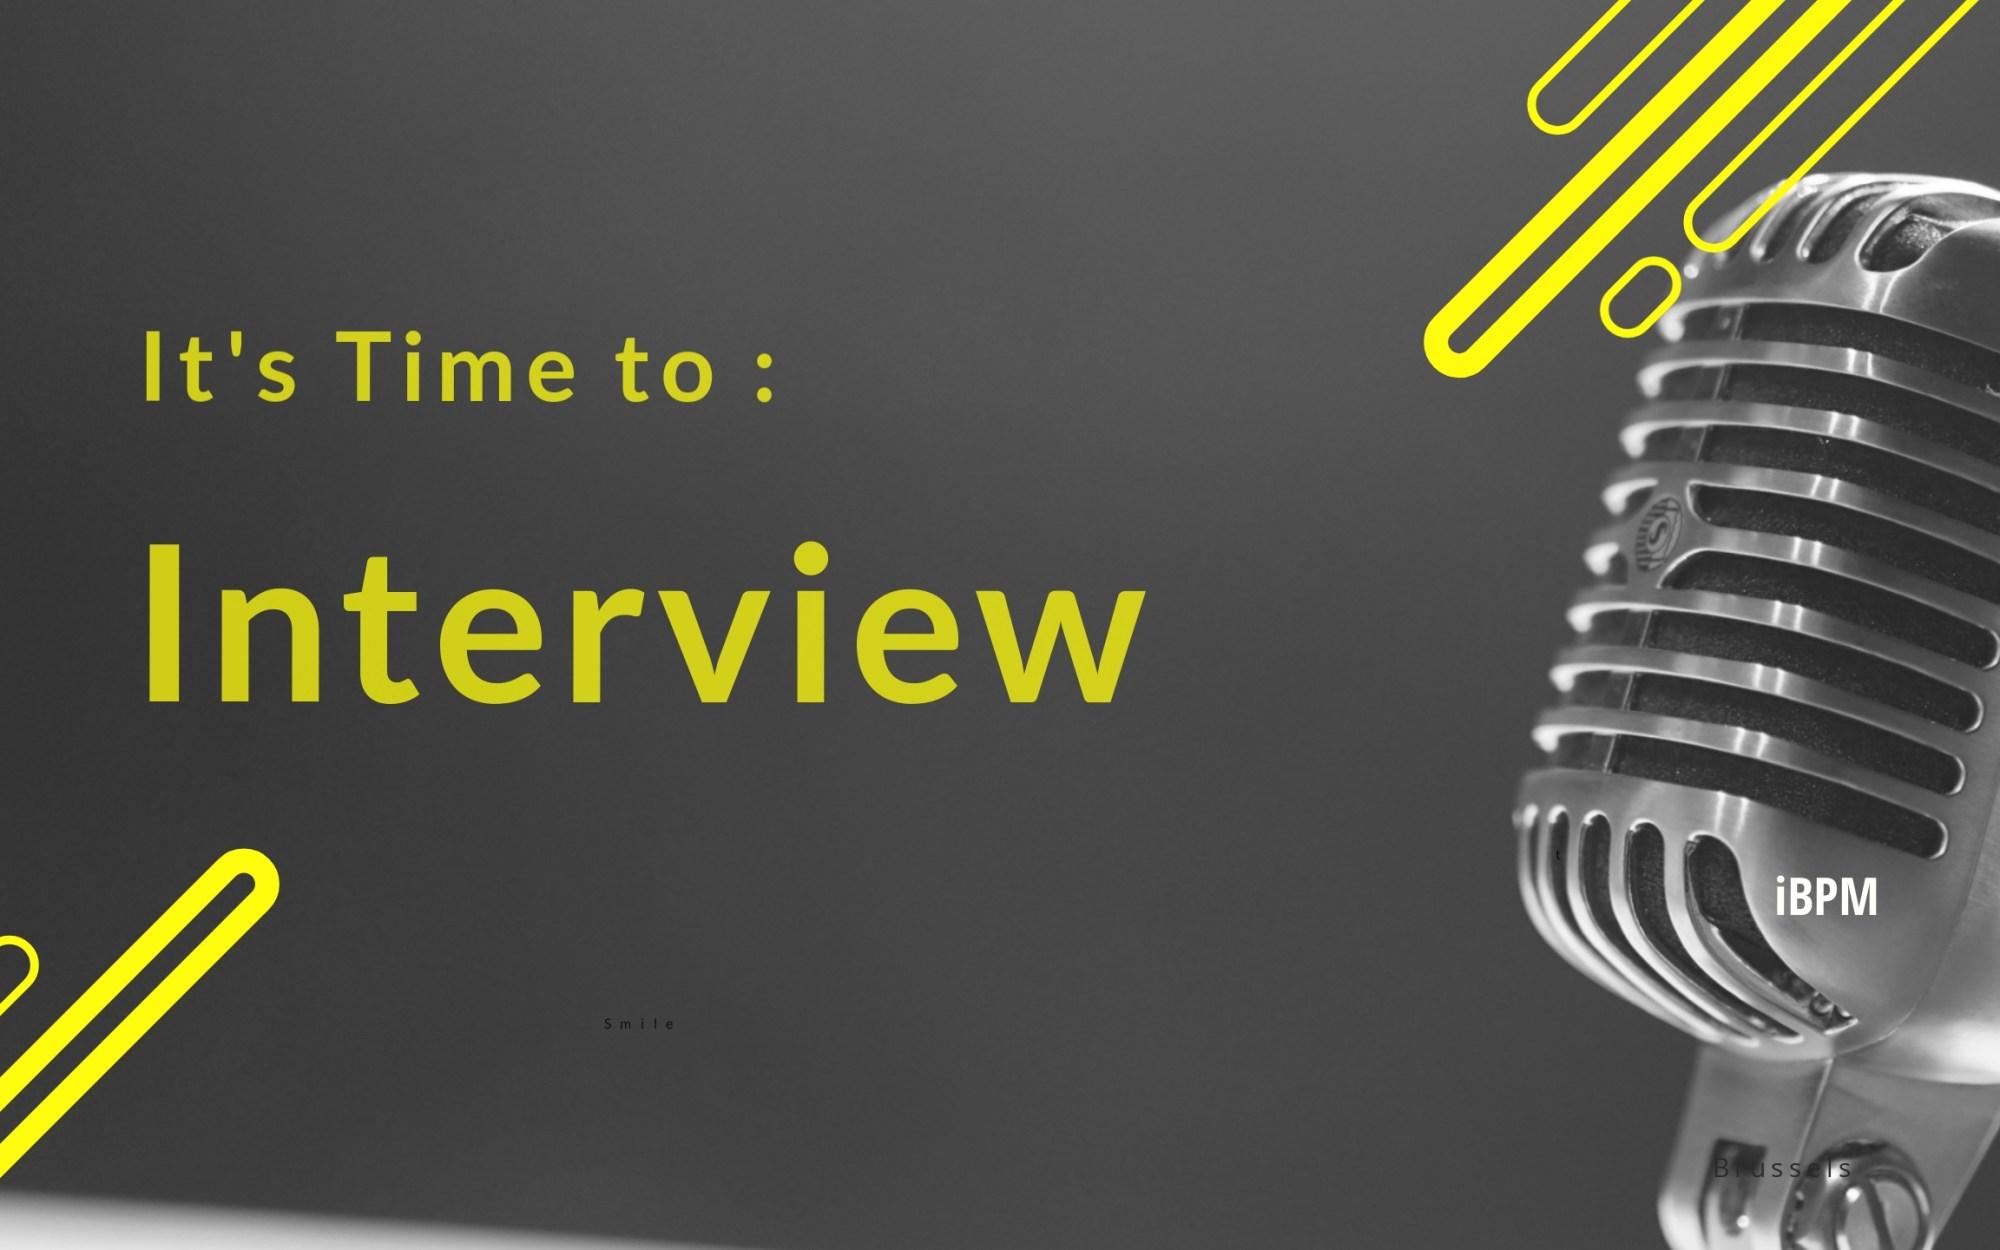 IBPM Production - Interview